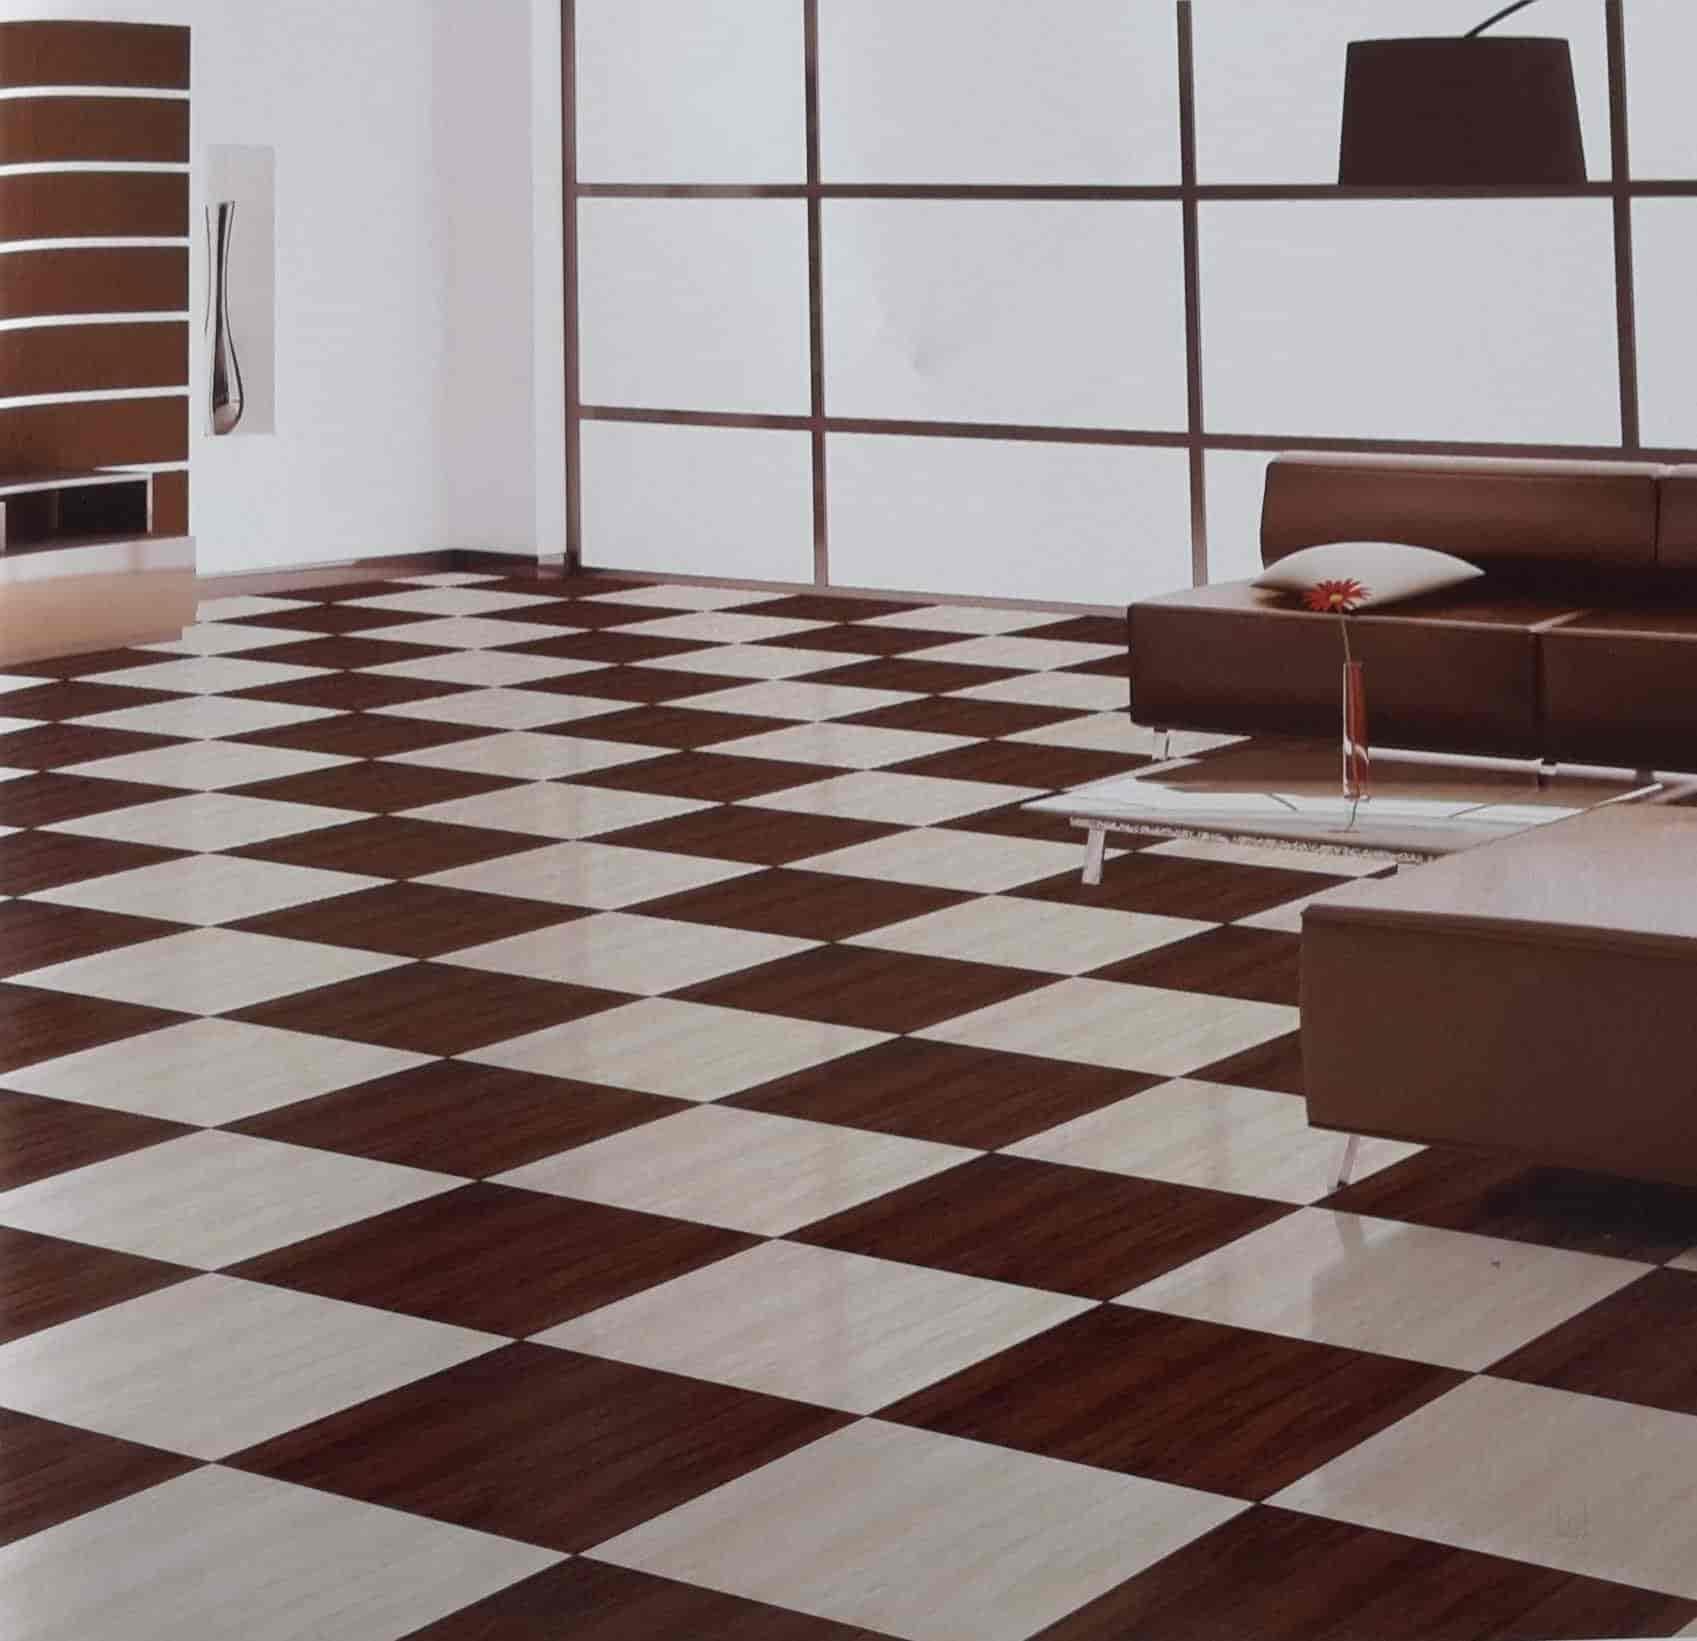 Stunning tile floor design ideas images home ideas design ceramic tile works omaha images tile flooring design ideas dailygadgetfo Image collections